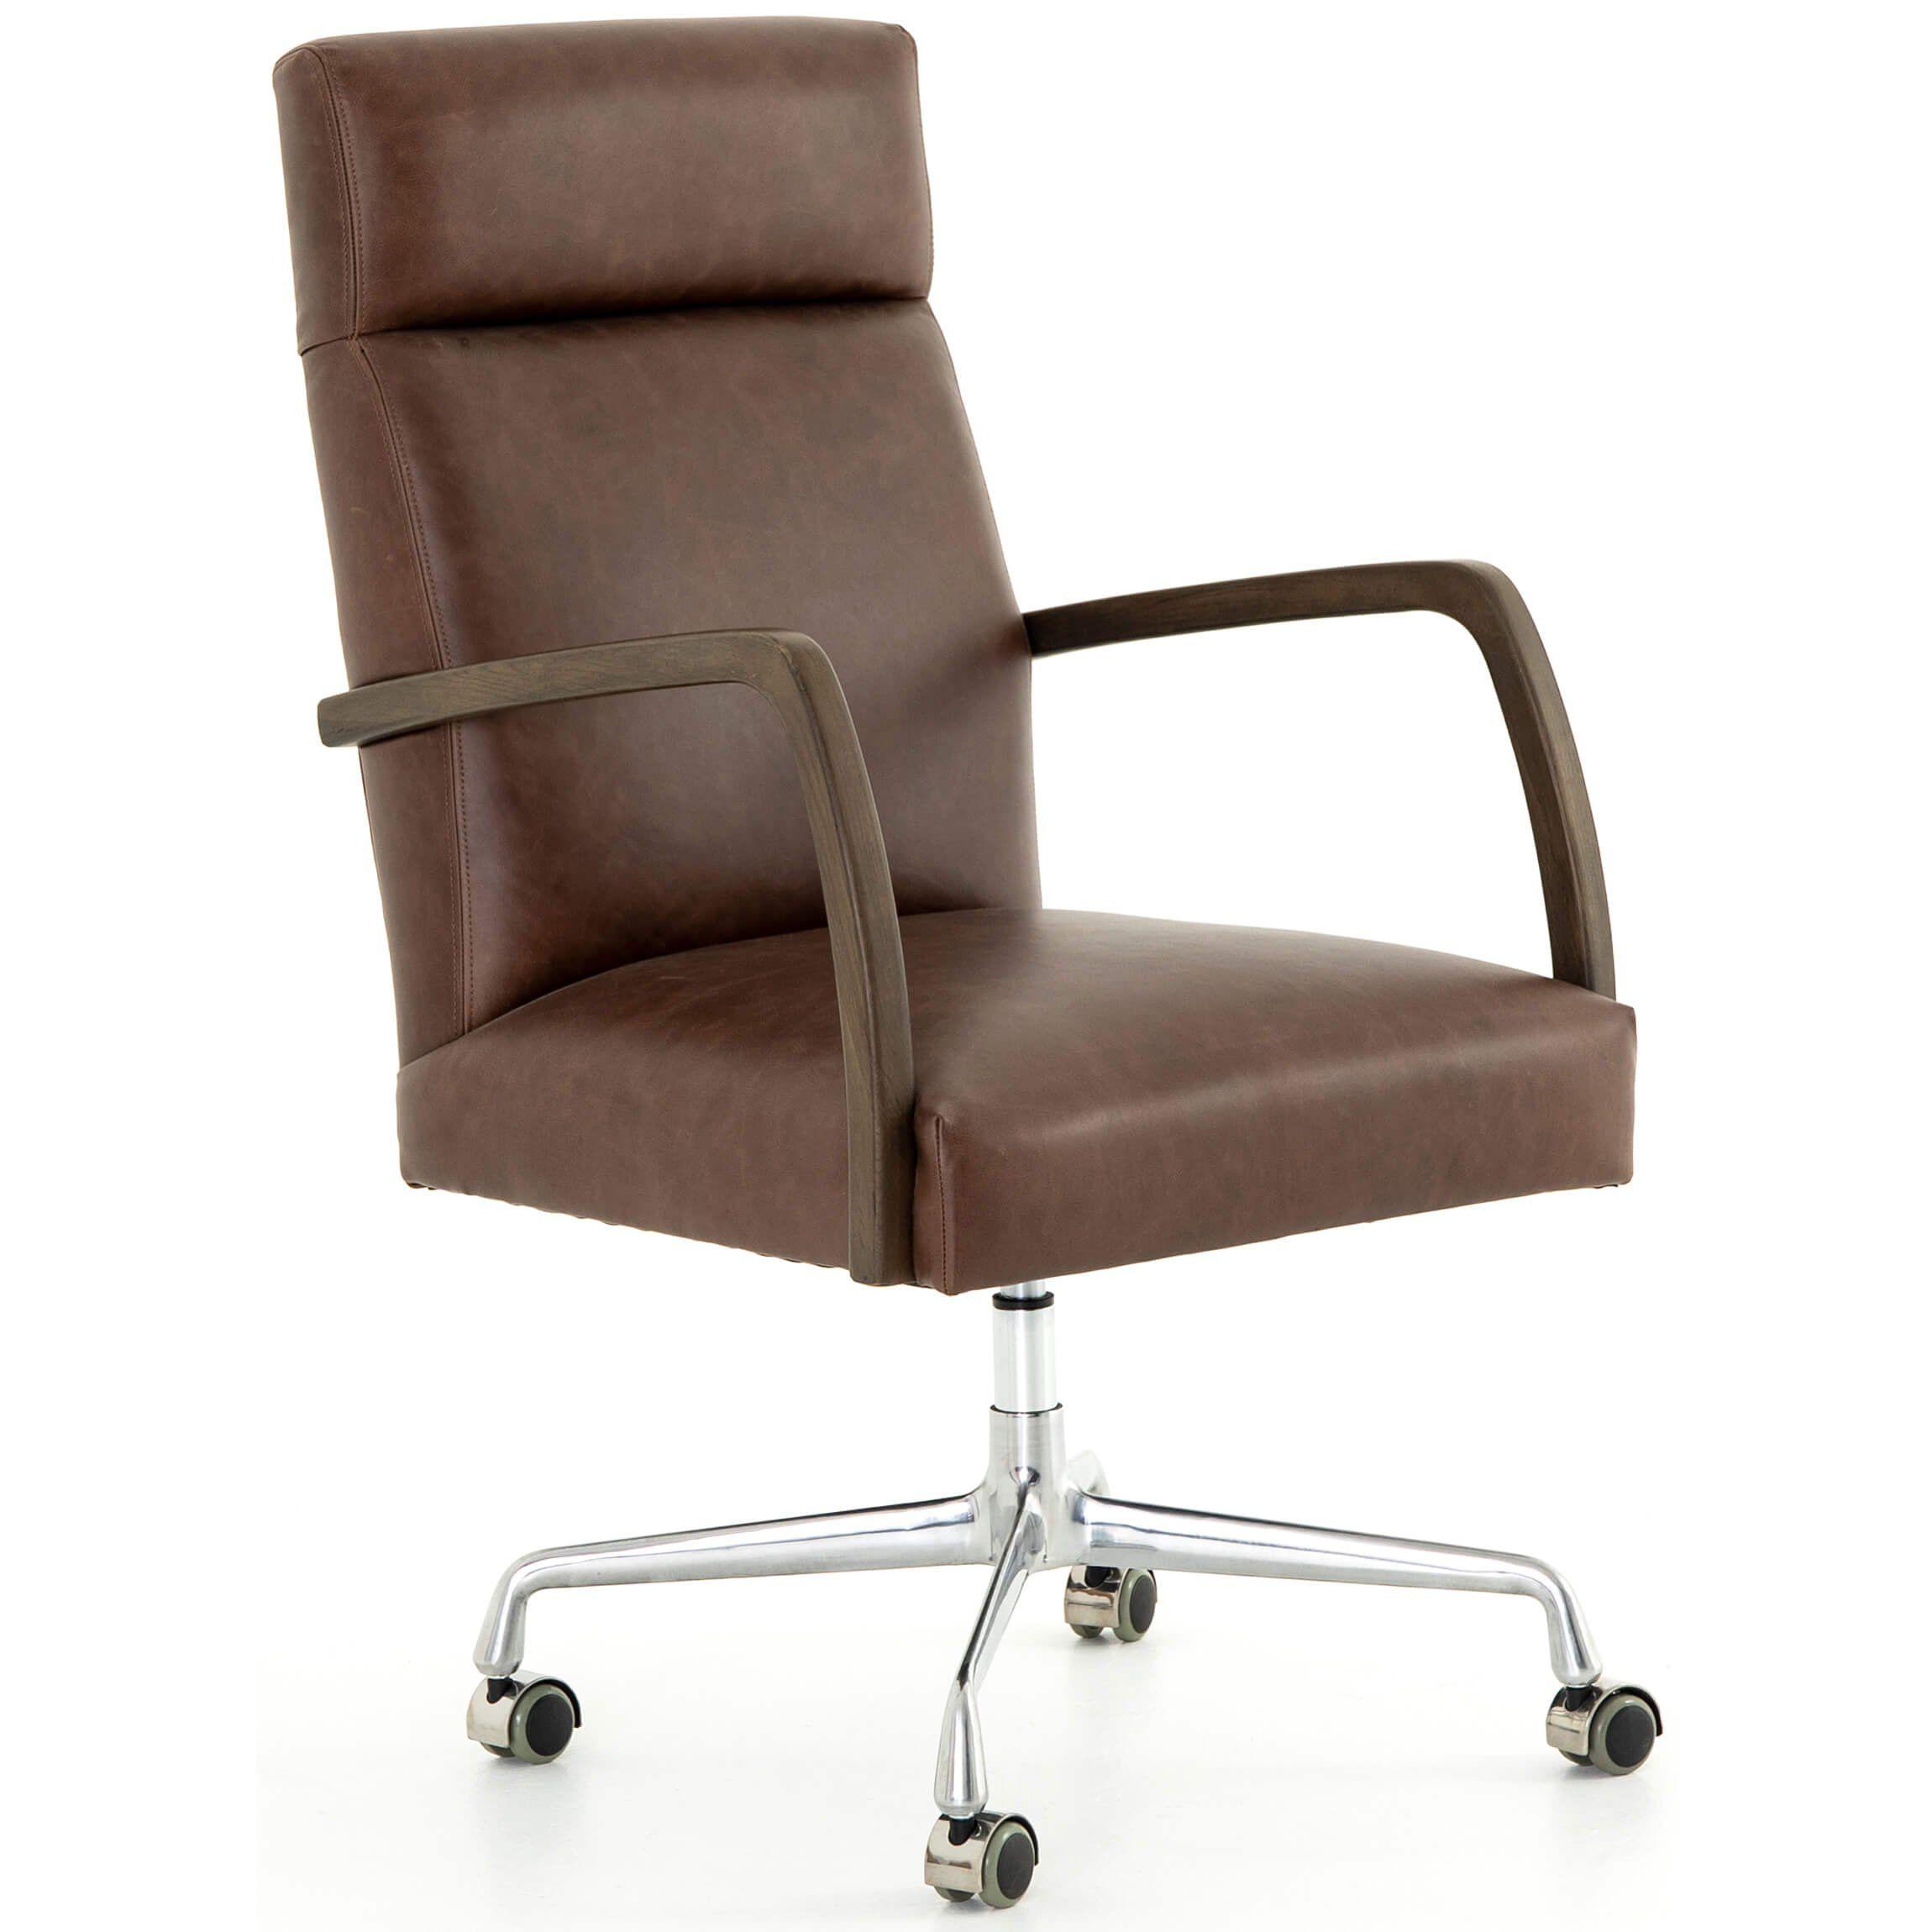 Bryson Leather Desk Chair Havana Brown In 2019 Desk Chair